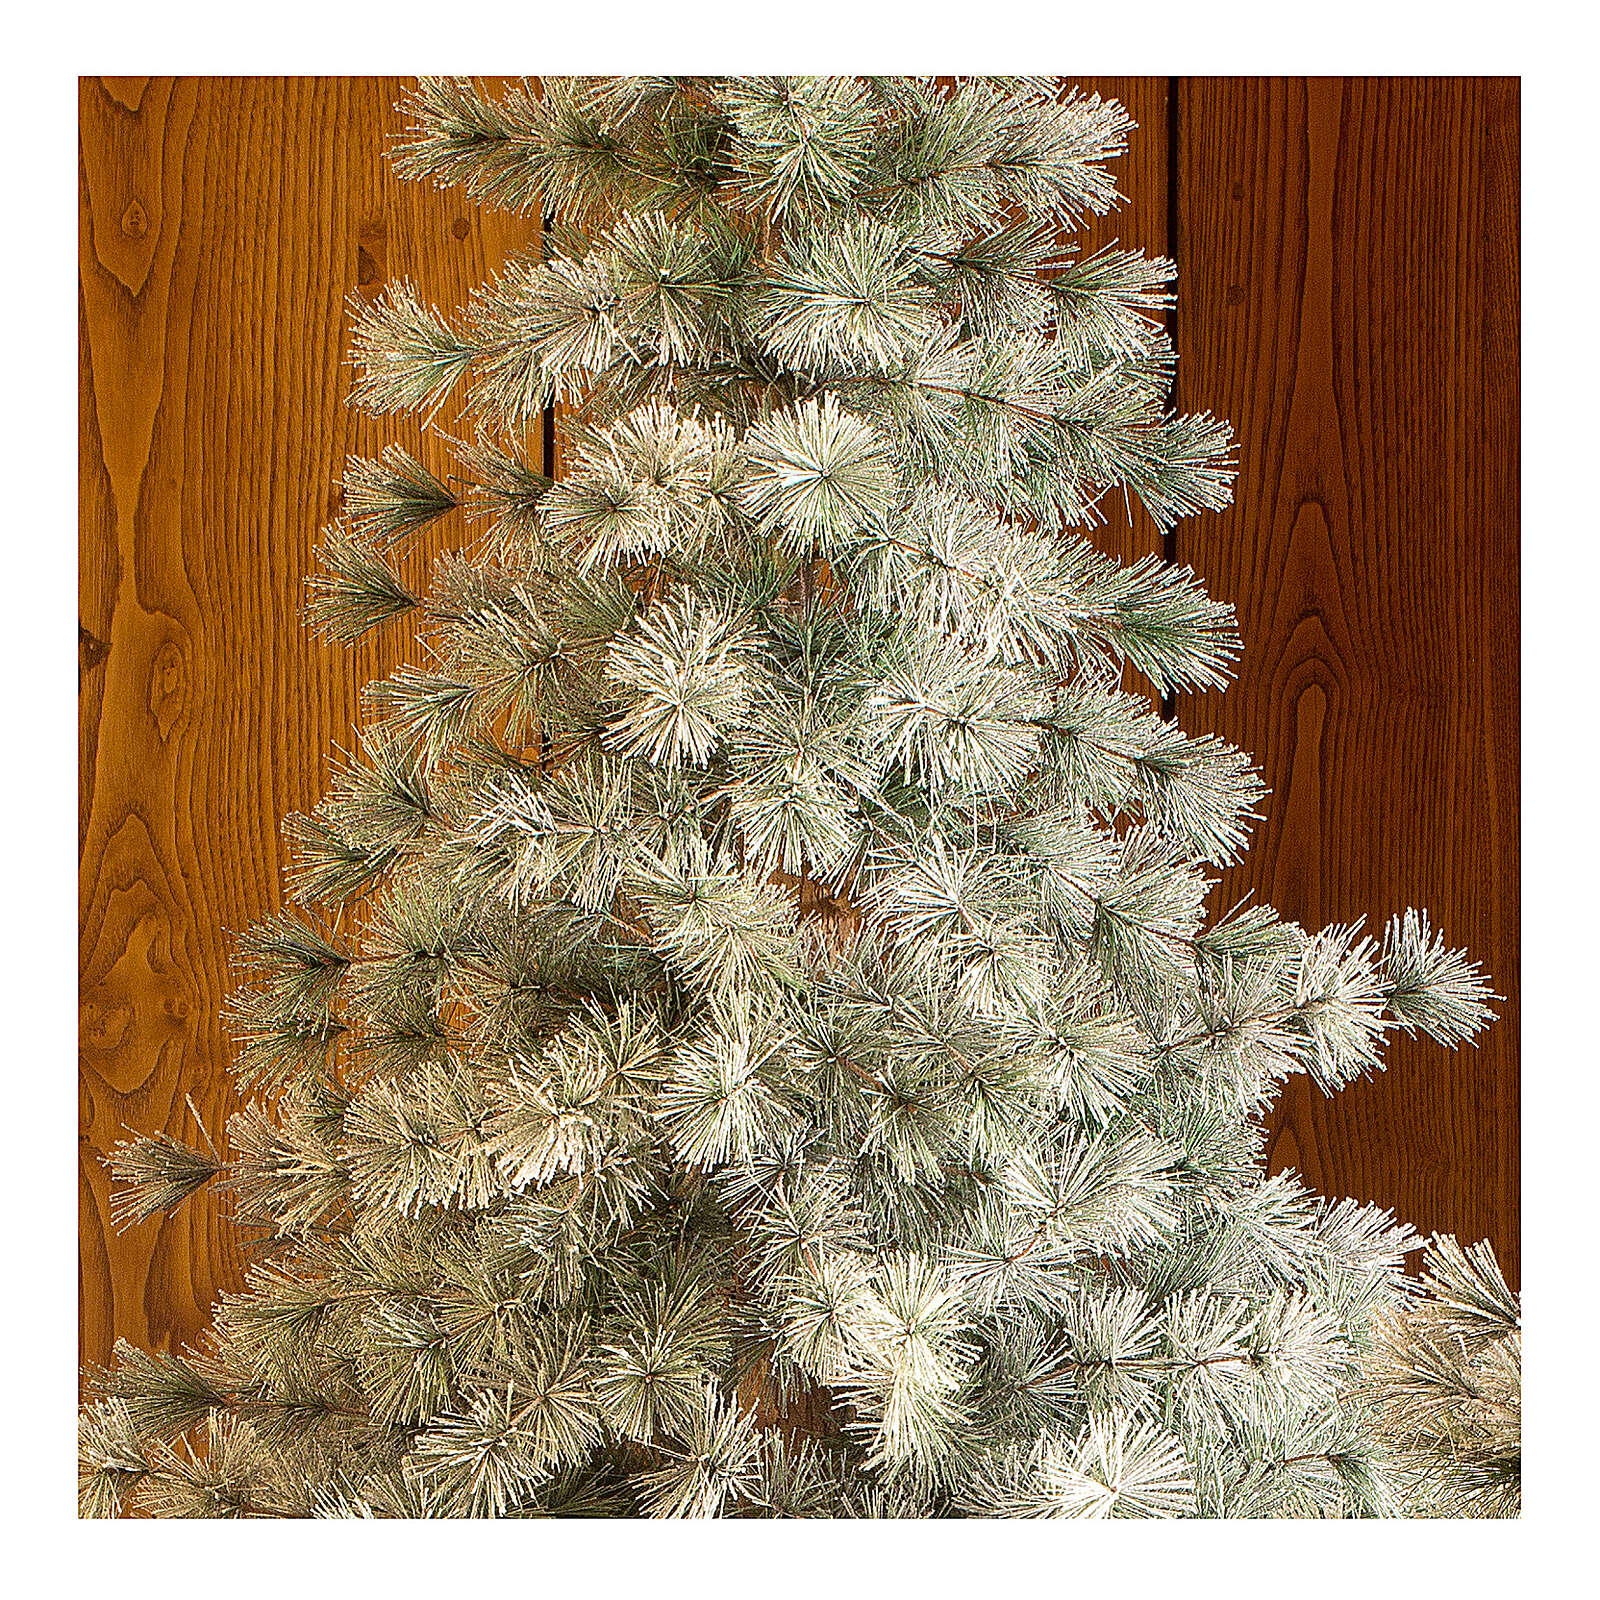 STOCK Sapin de Noël 210 Aspen Pine enneigé 3